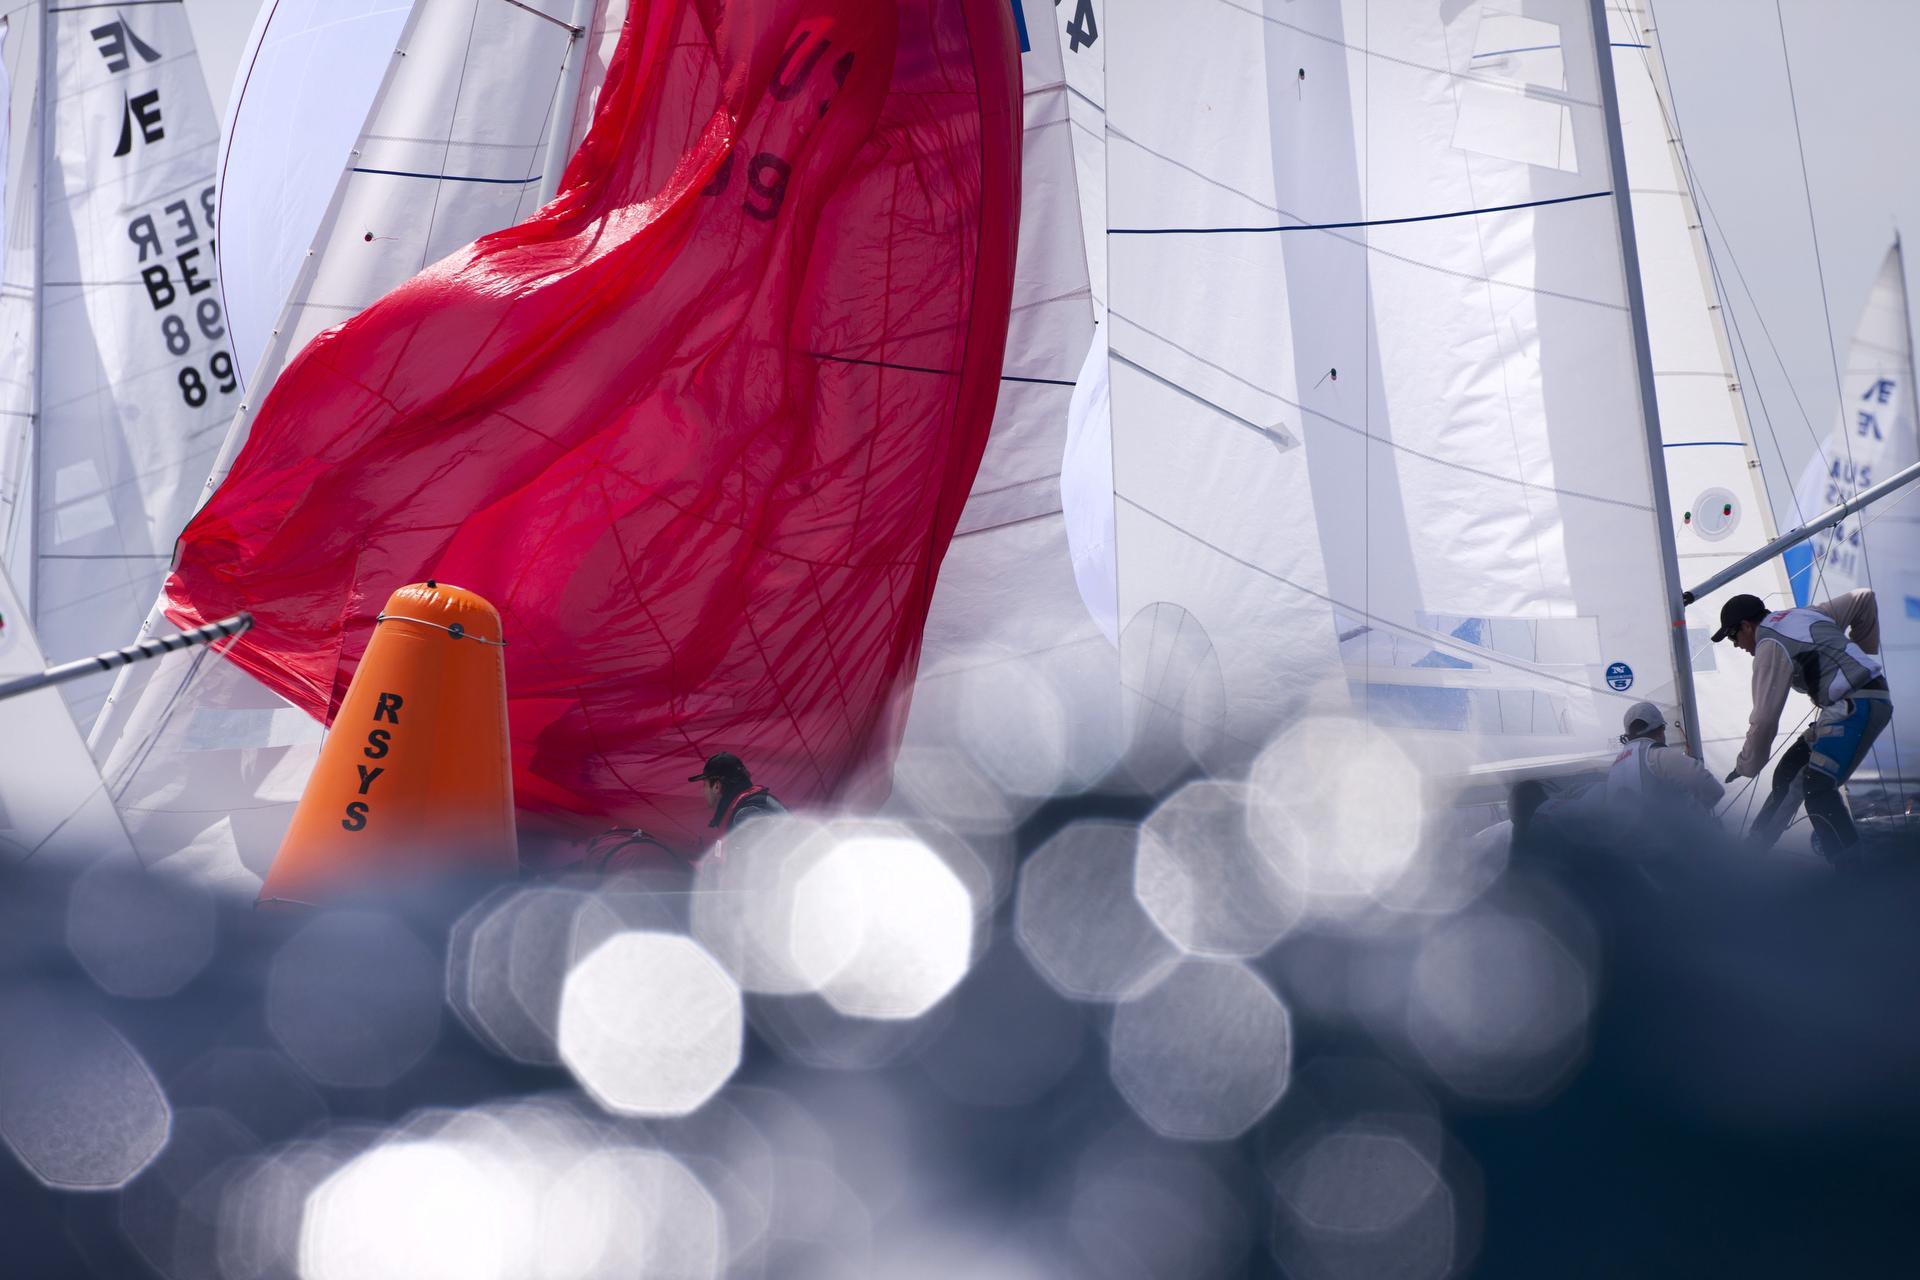 Sydney Sailing Photographer, Aerial Photography, Etchells, Spinnaker, Wave, Yacht, Regatta, Ocean Racing